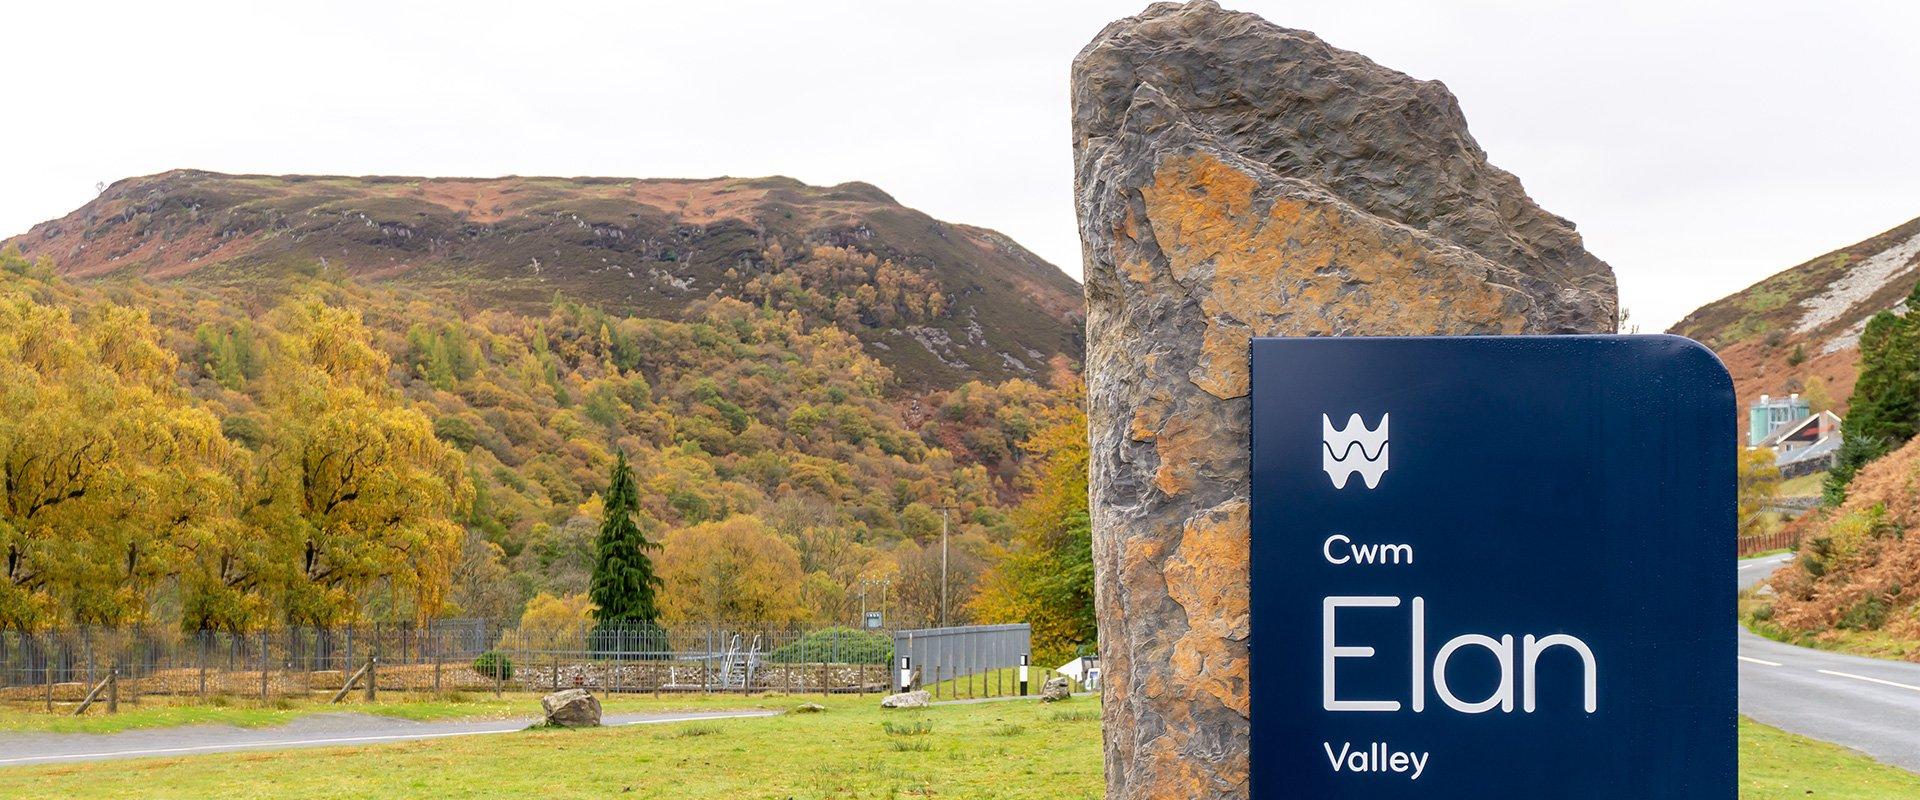 Dwr Cymru Welsh Water Elan Valley stone sign